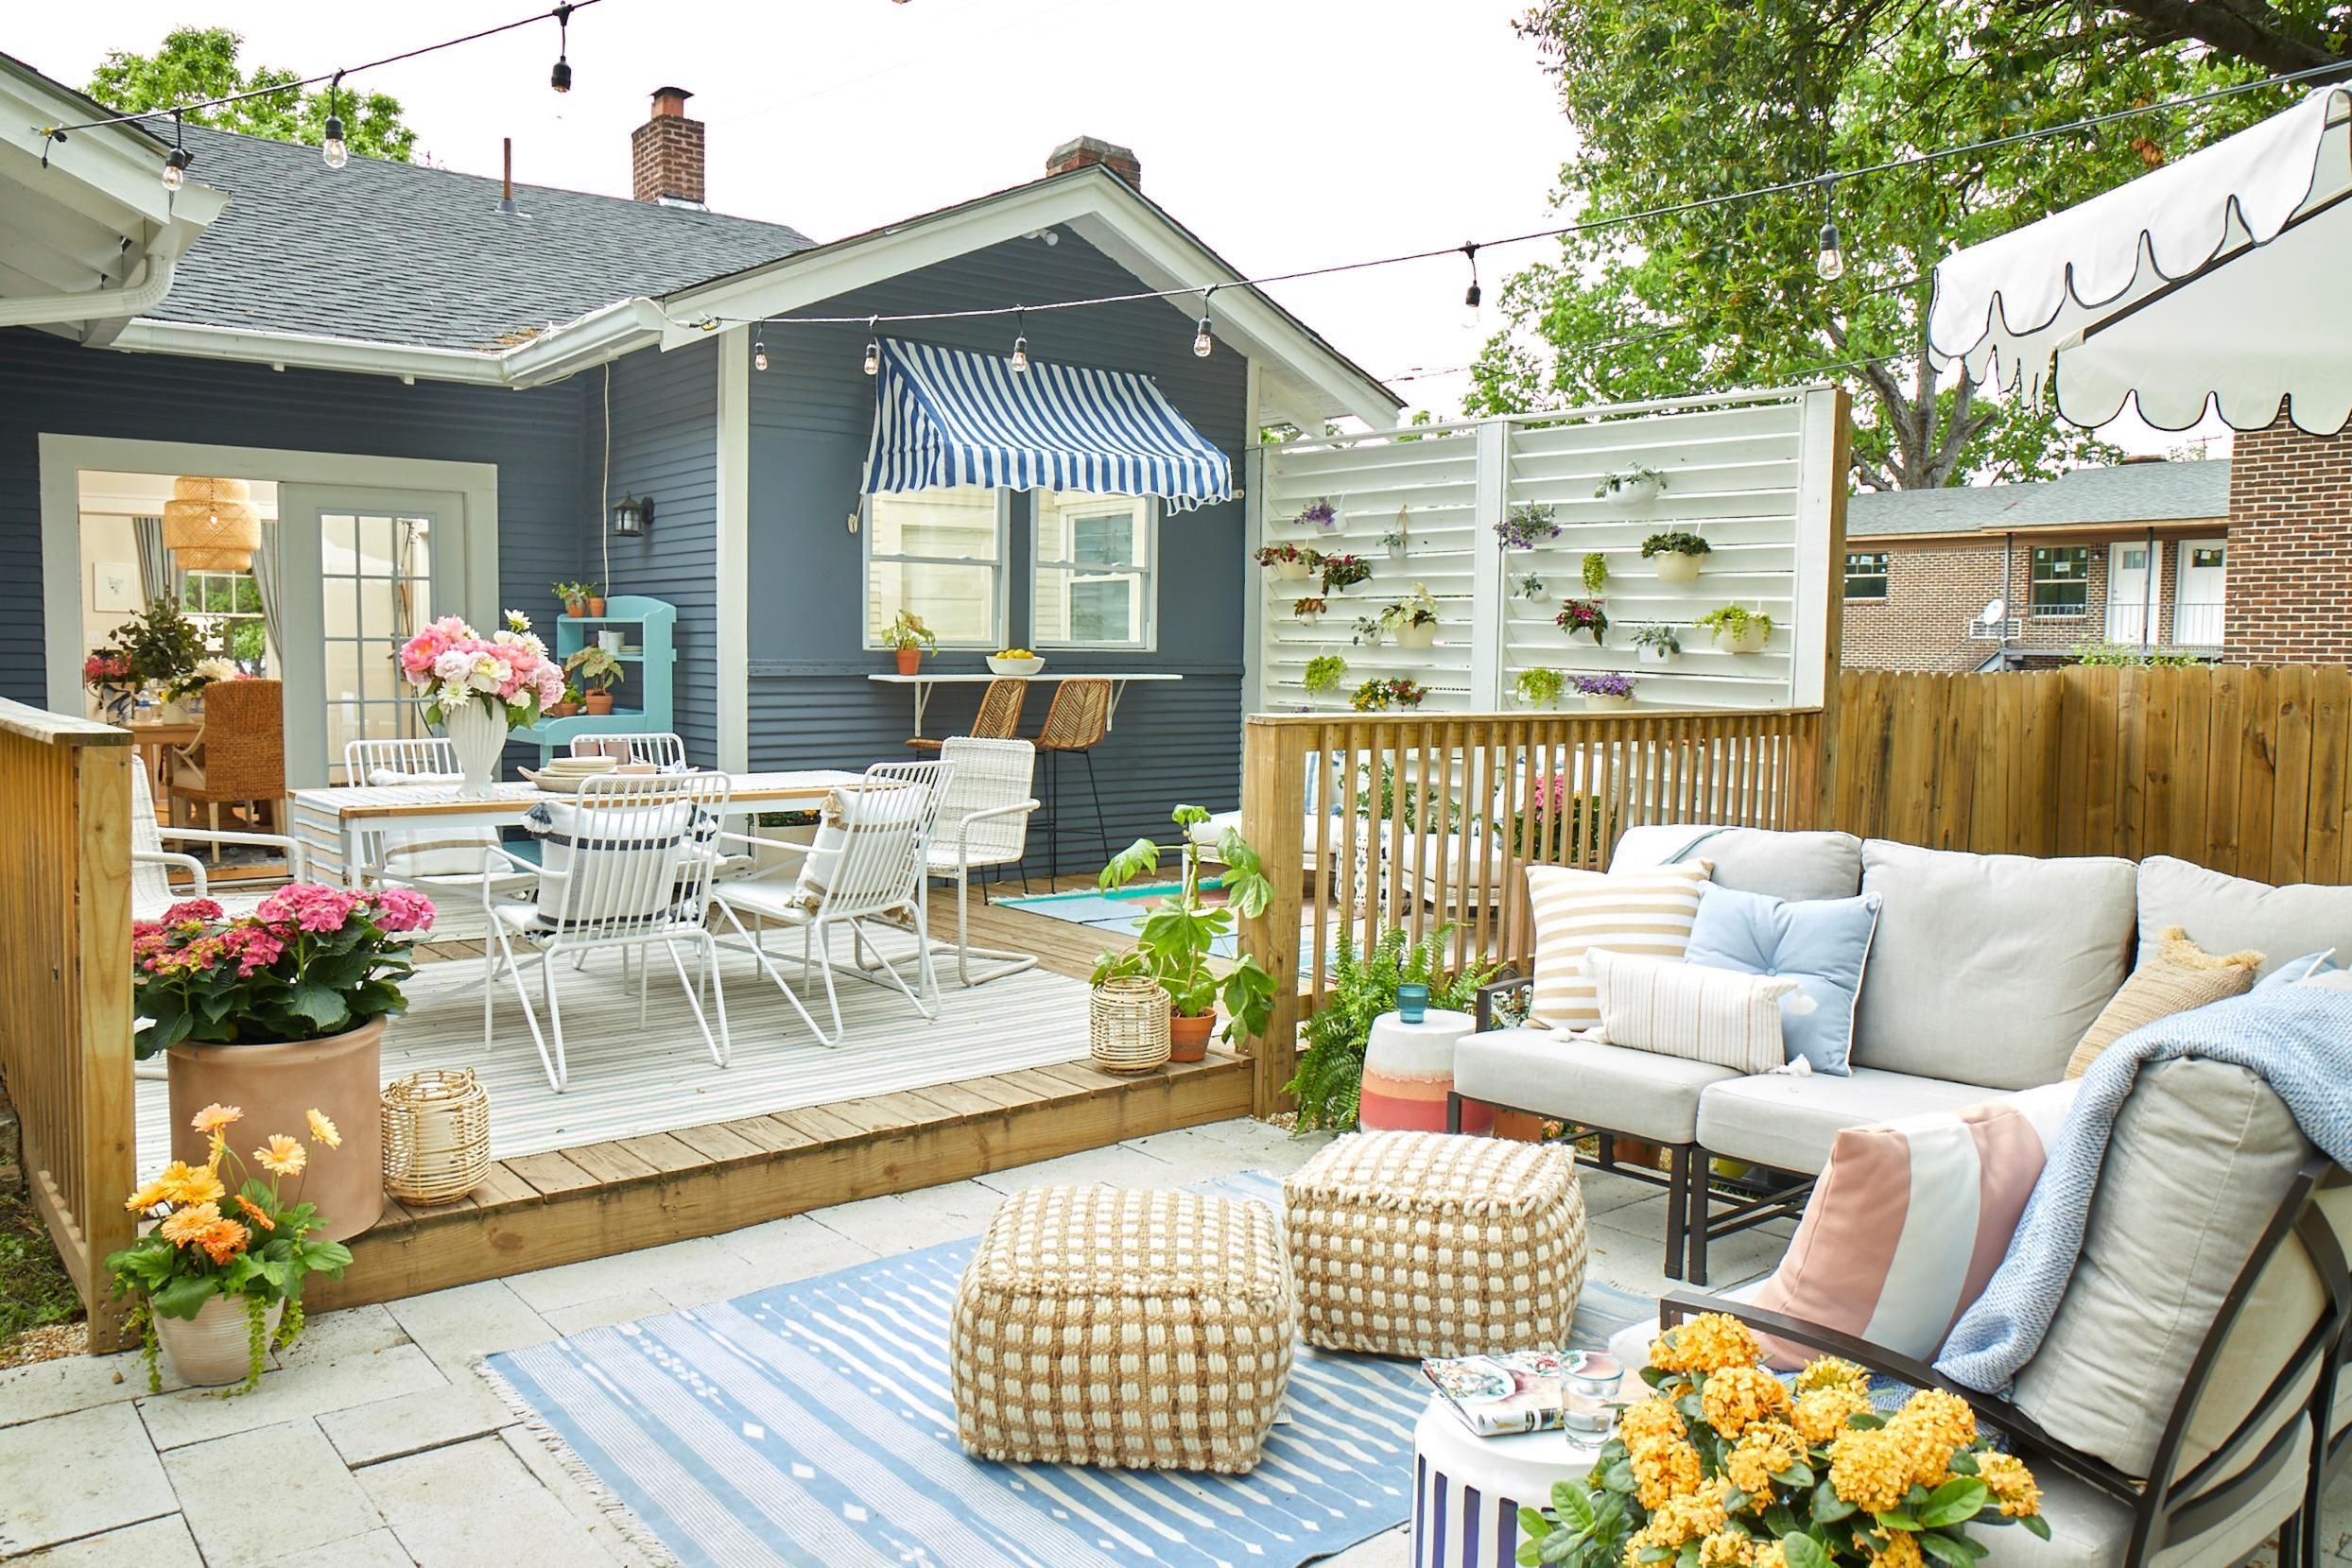 50 best patio and porch design ideas